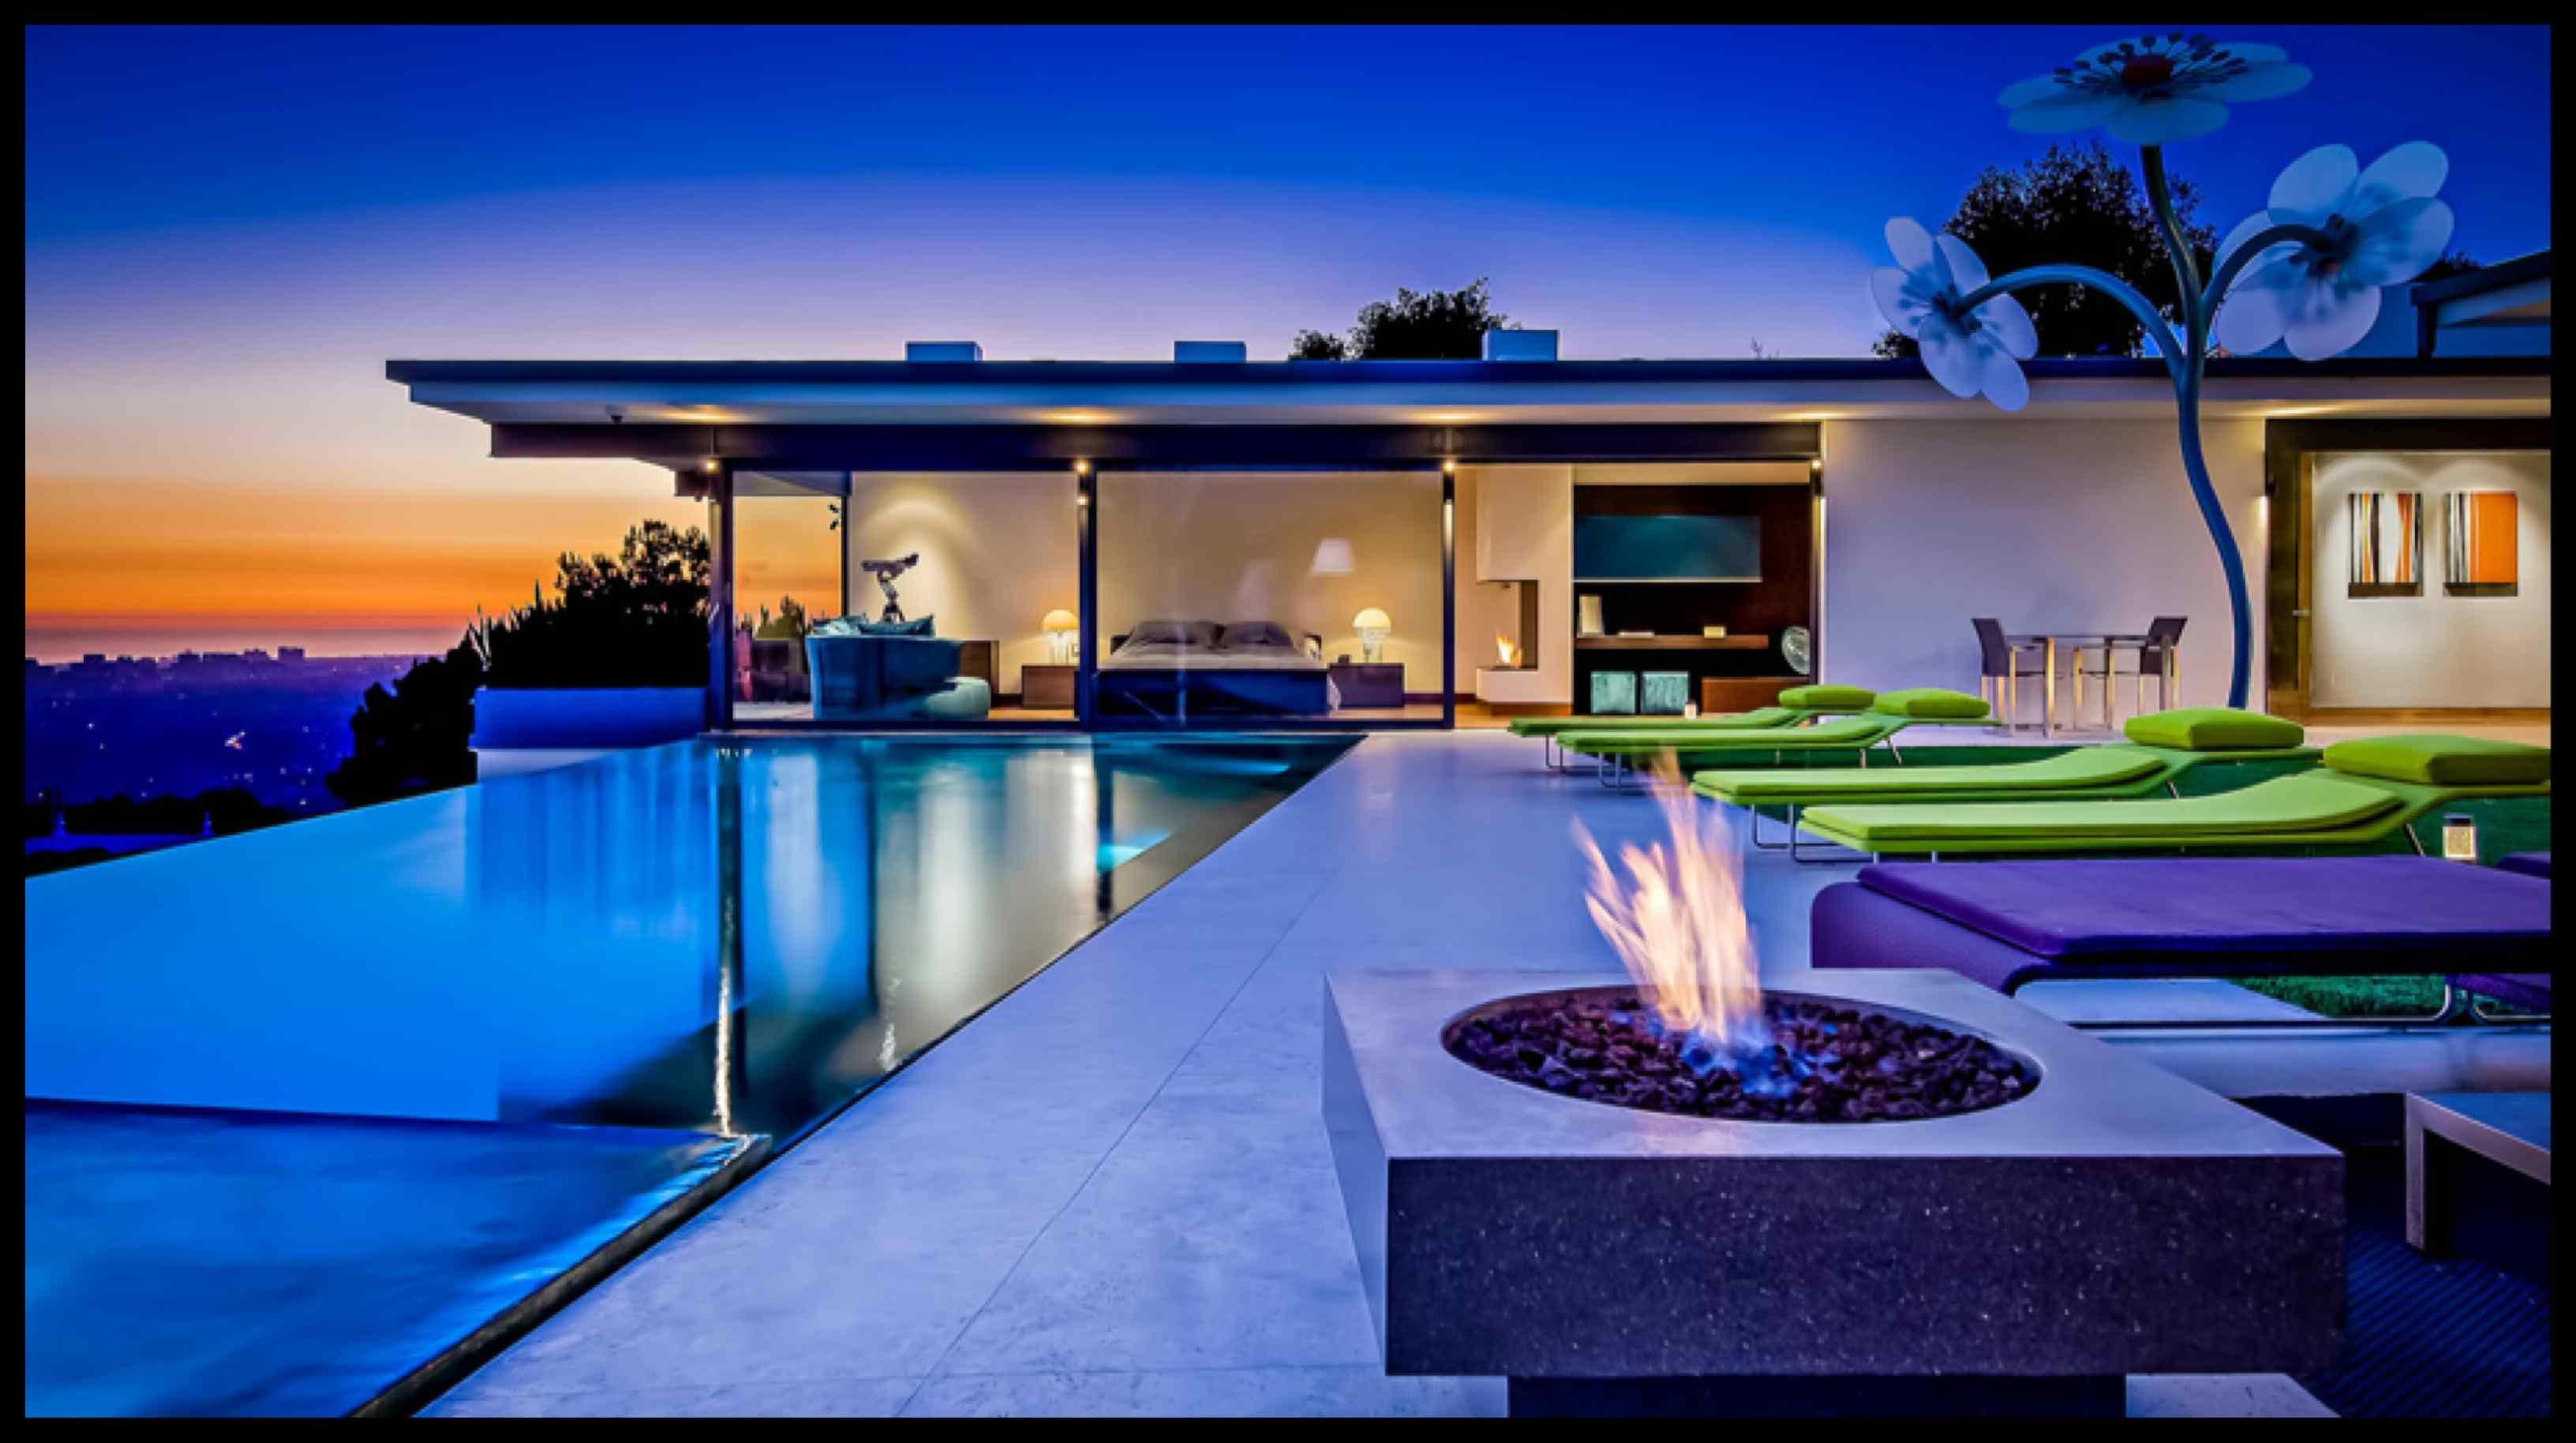 Verdens fineste og st rste hus side 2 hus hage og for Dream homes for sale in california